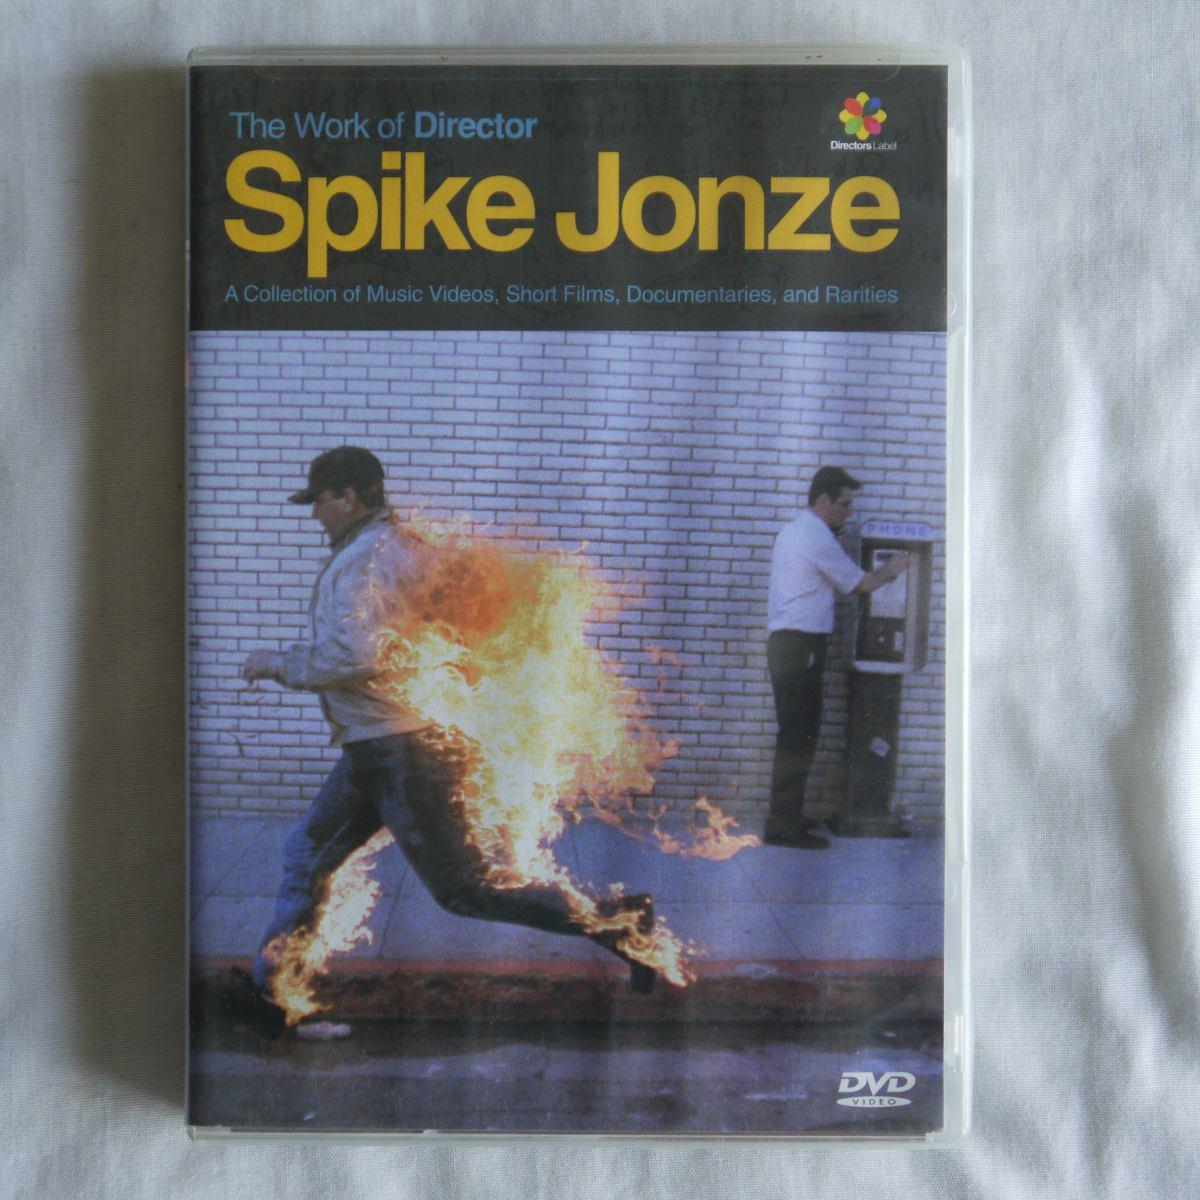 Pelicula Dvd The Work Of Director Spike Jonze - $ 450 00